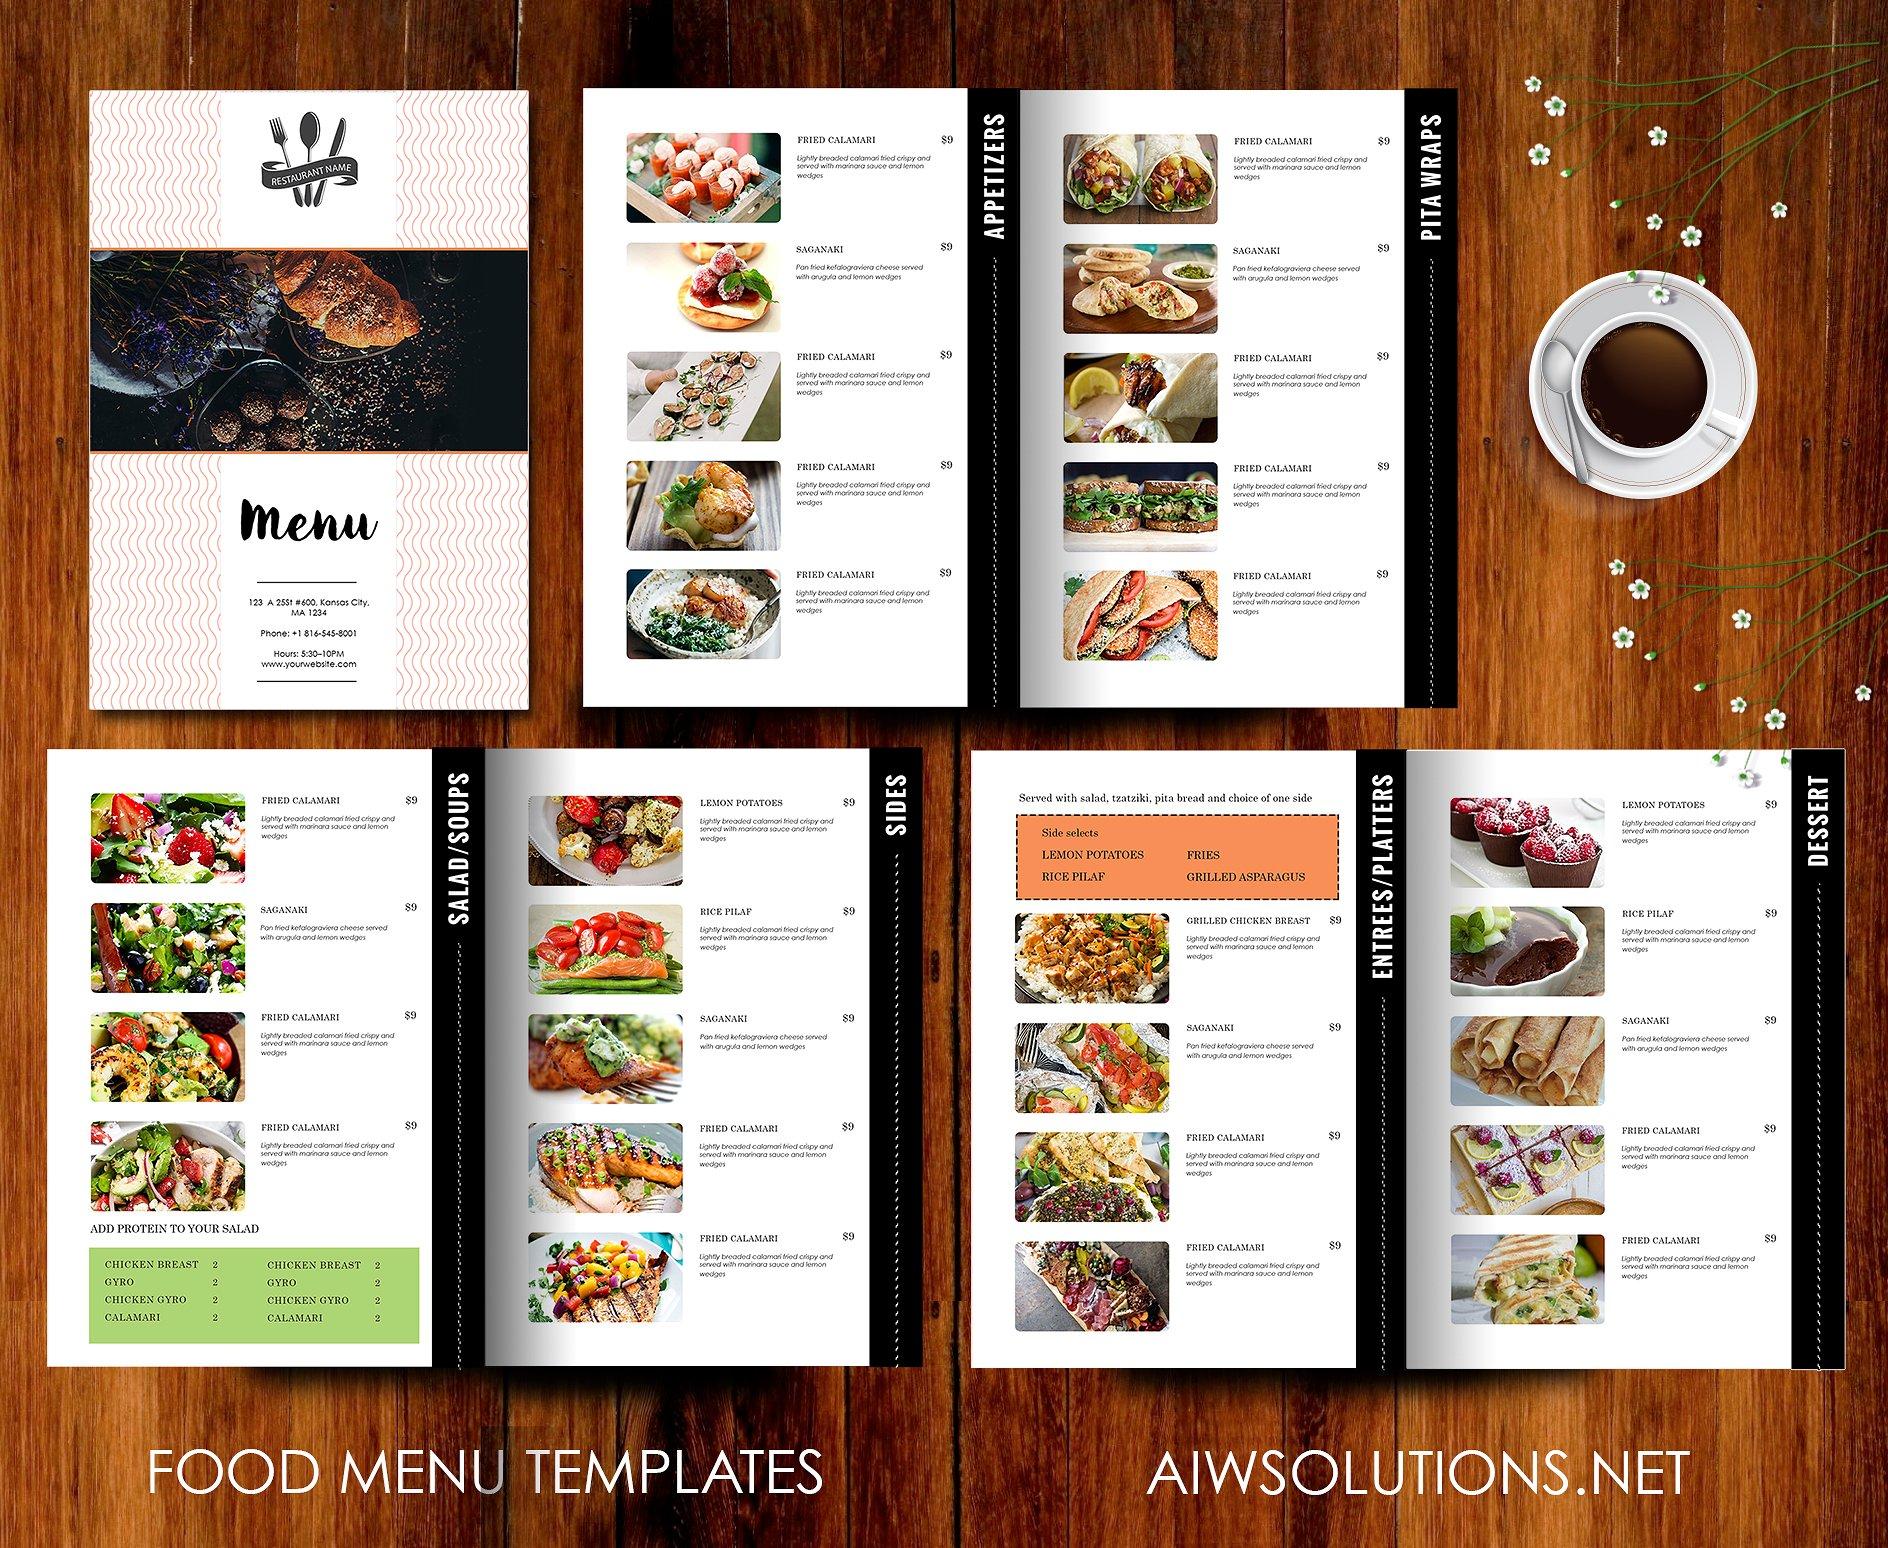 restaurant menu templates free | datariouruguay